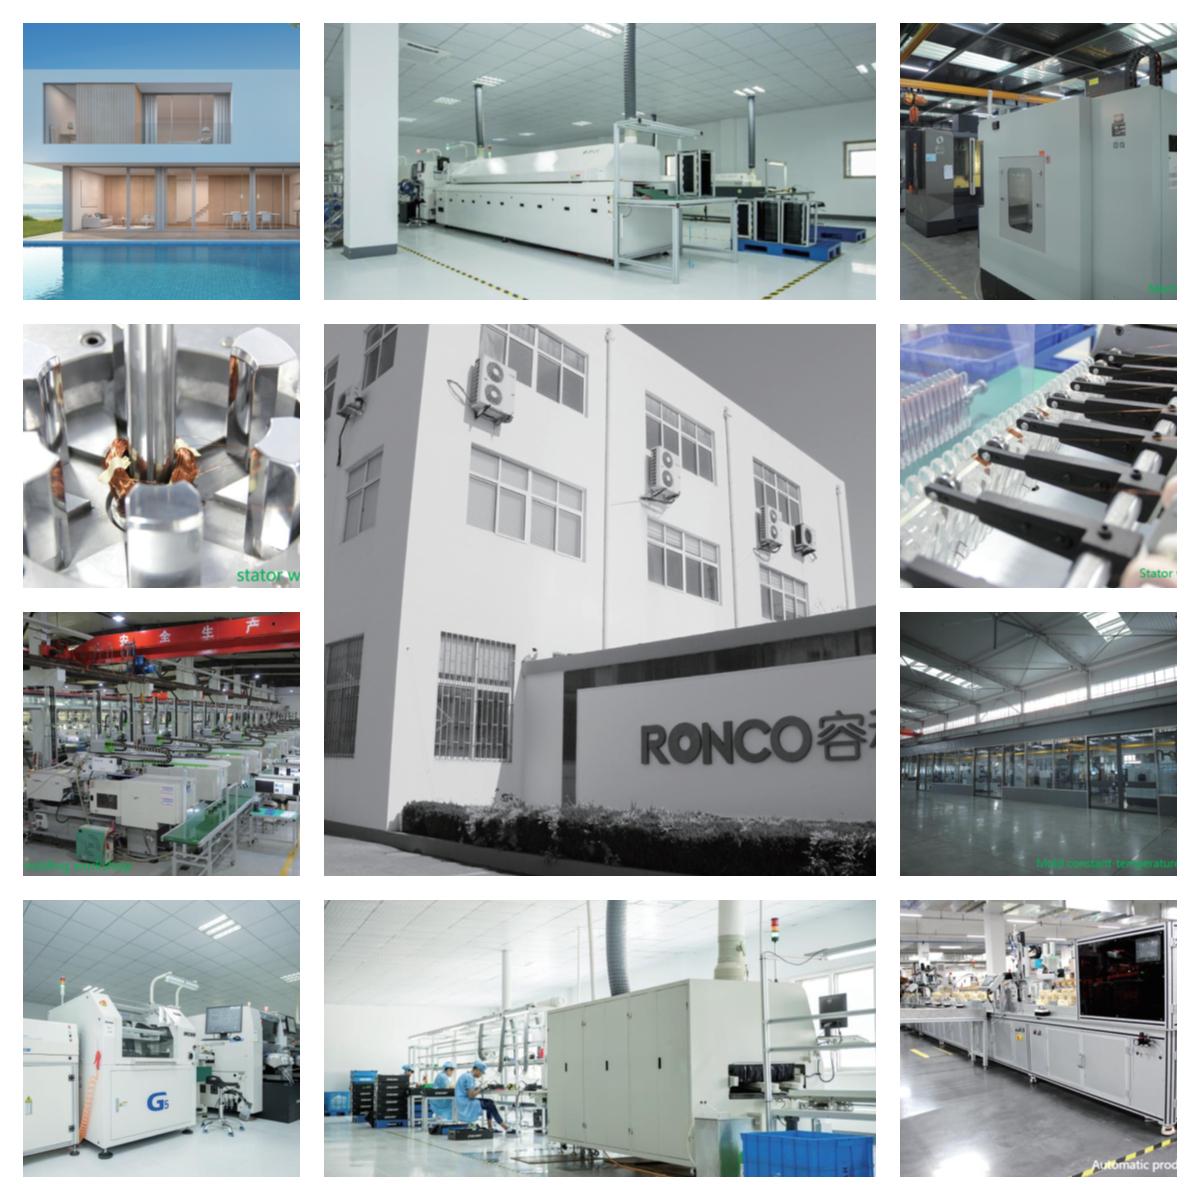 Qingdao Ronco Mechanic Electronic Technology Co., Ltd. Main Image